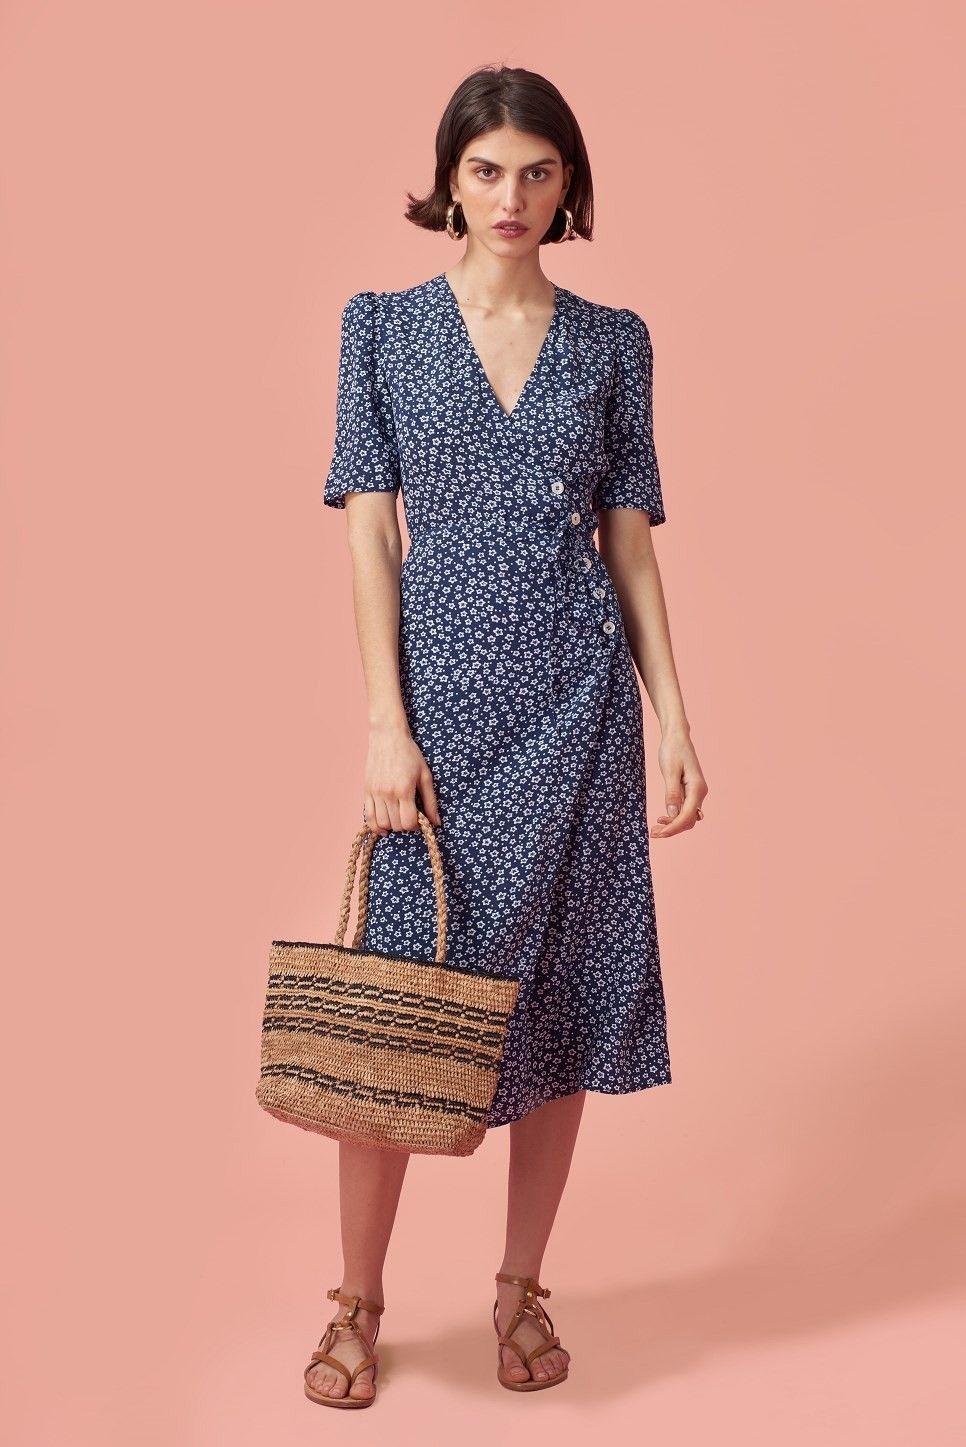 Challenge: Fashion Fancy Dresses for Daytime fotos